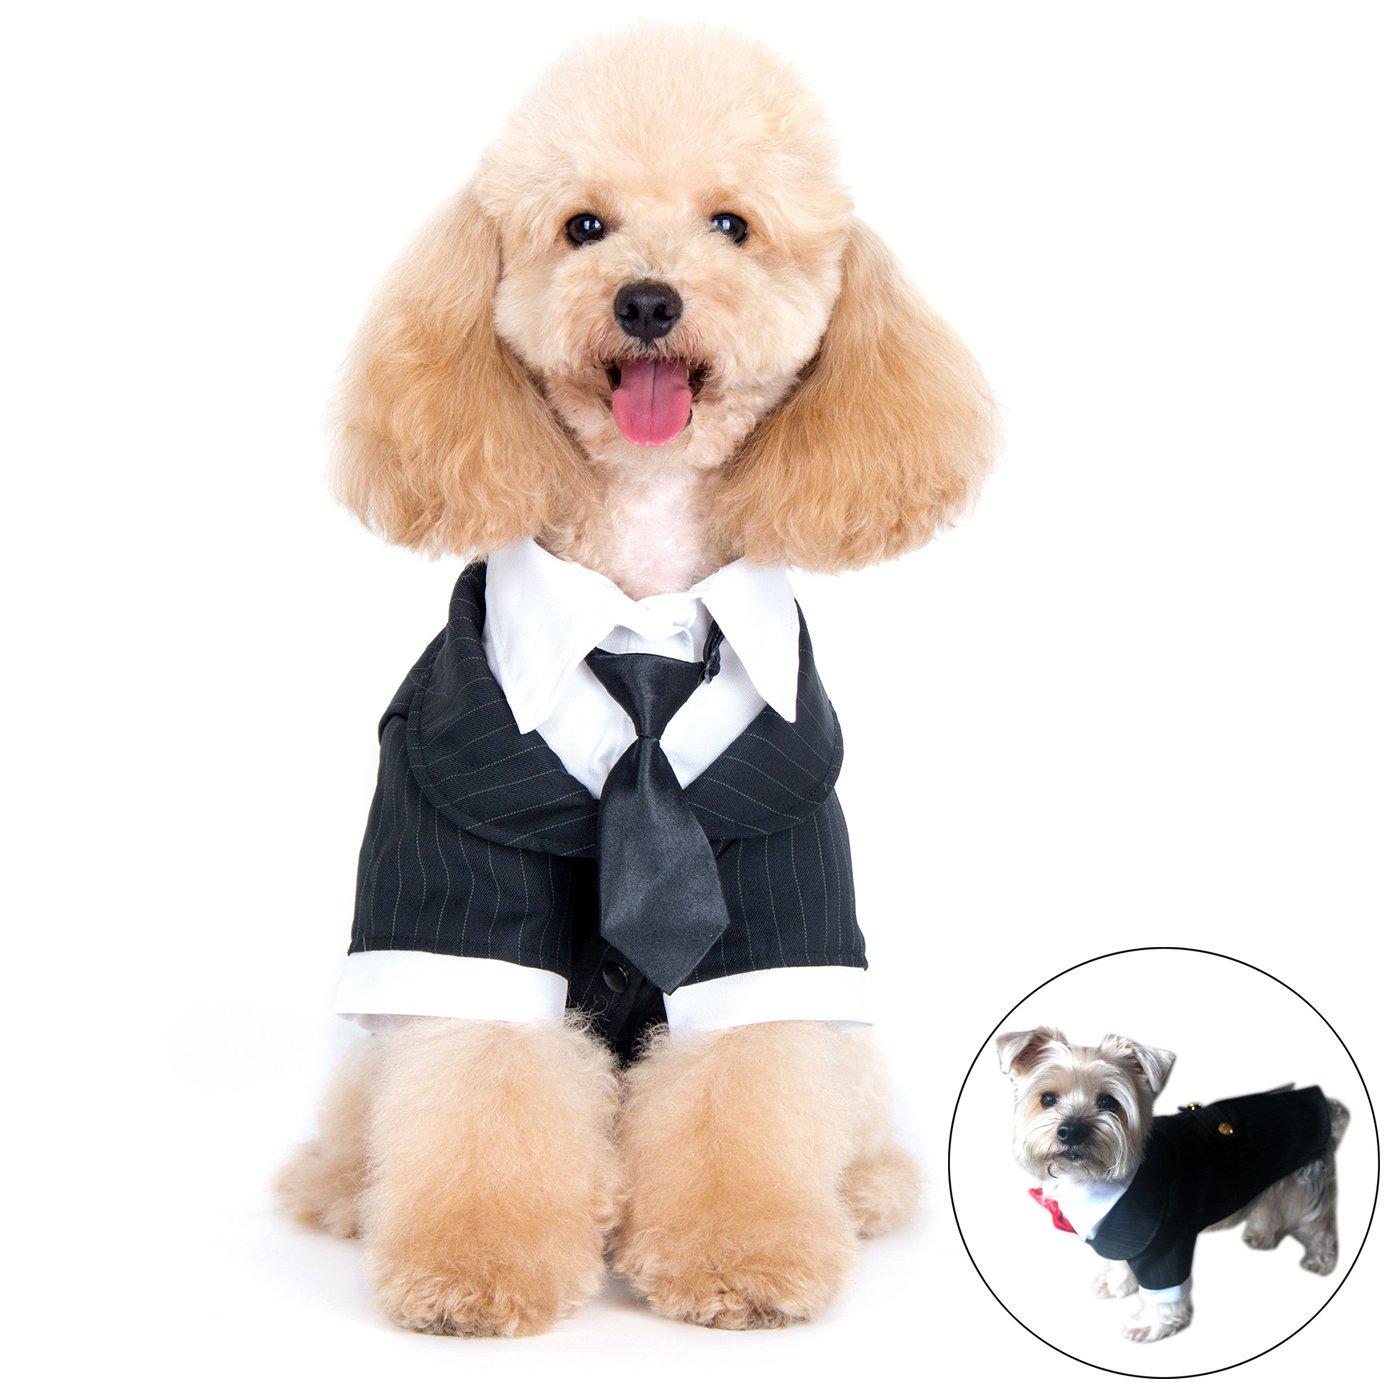 Alfie Pet Petoga Couture - Oscar Formal Tuxedo Black Tie Red Bow Tie - Color: Black, Size: Medium